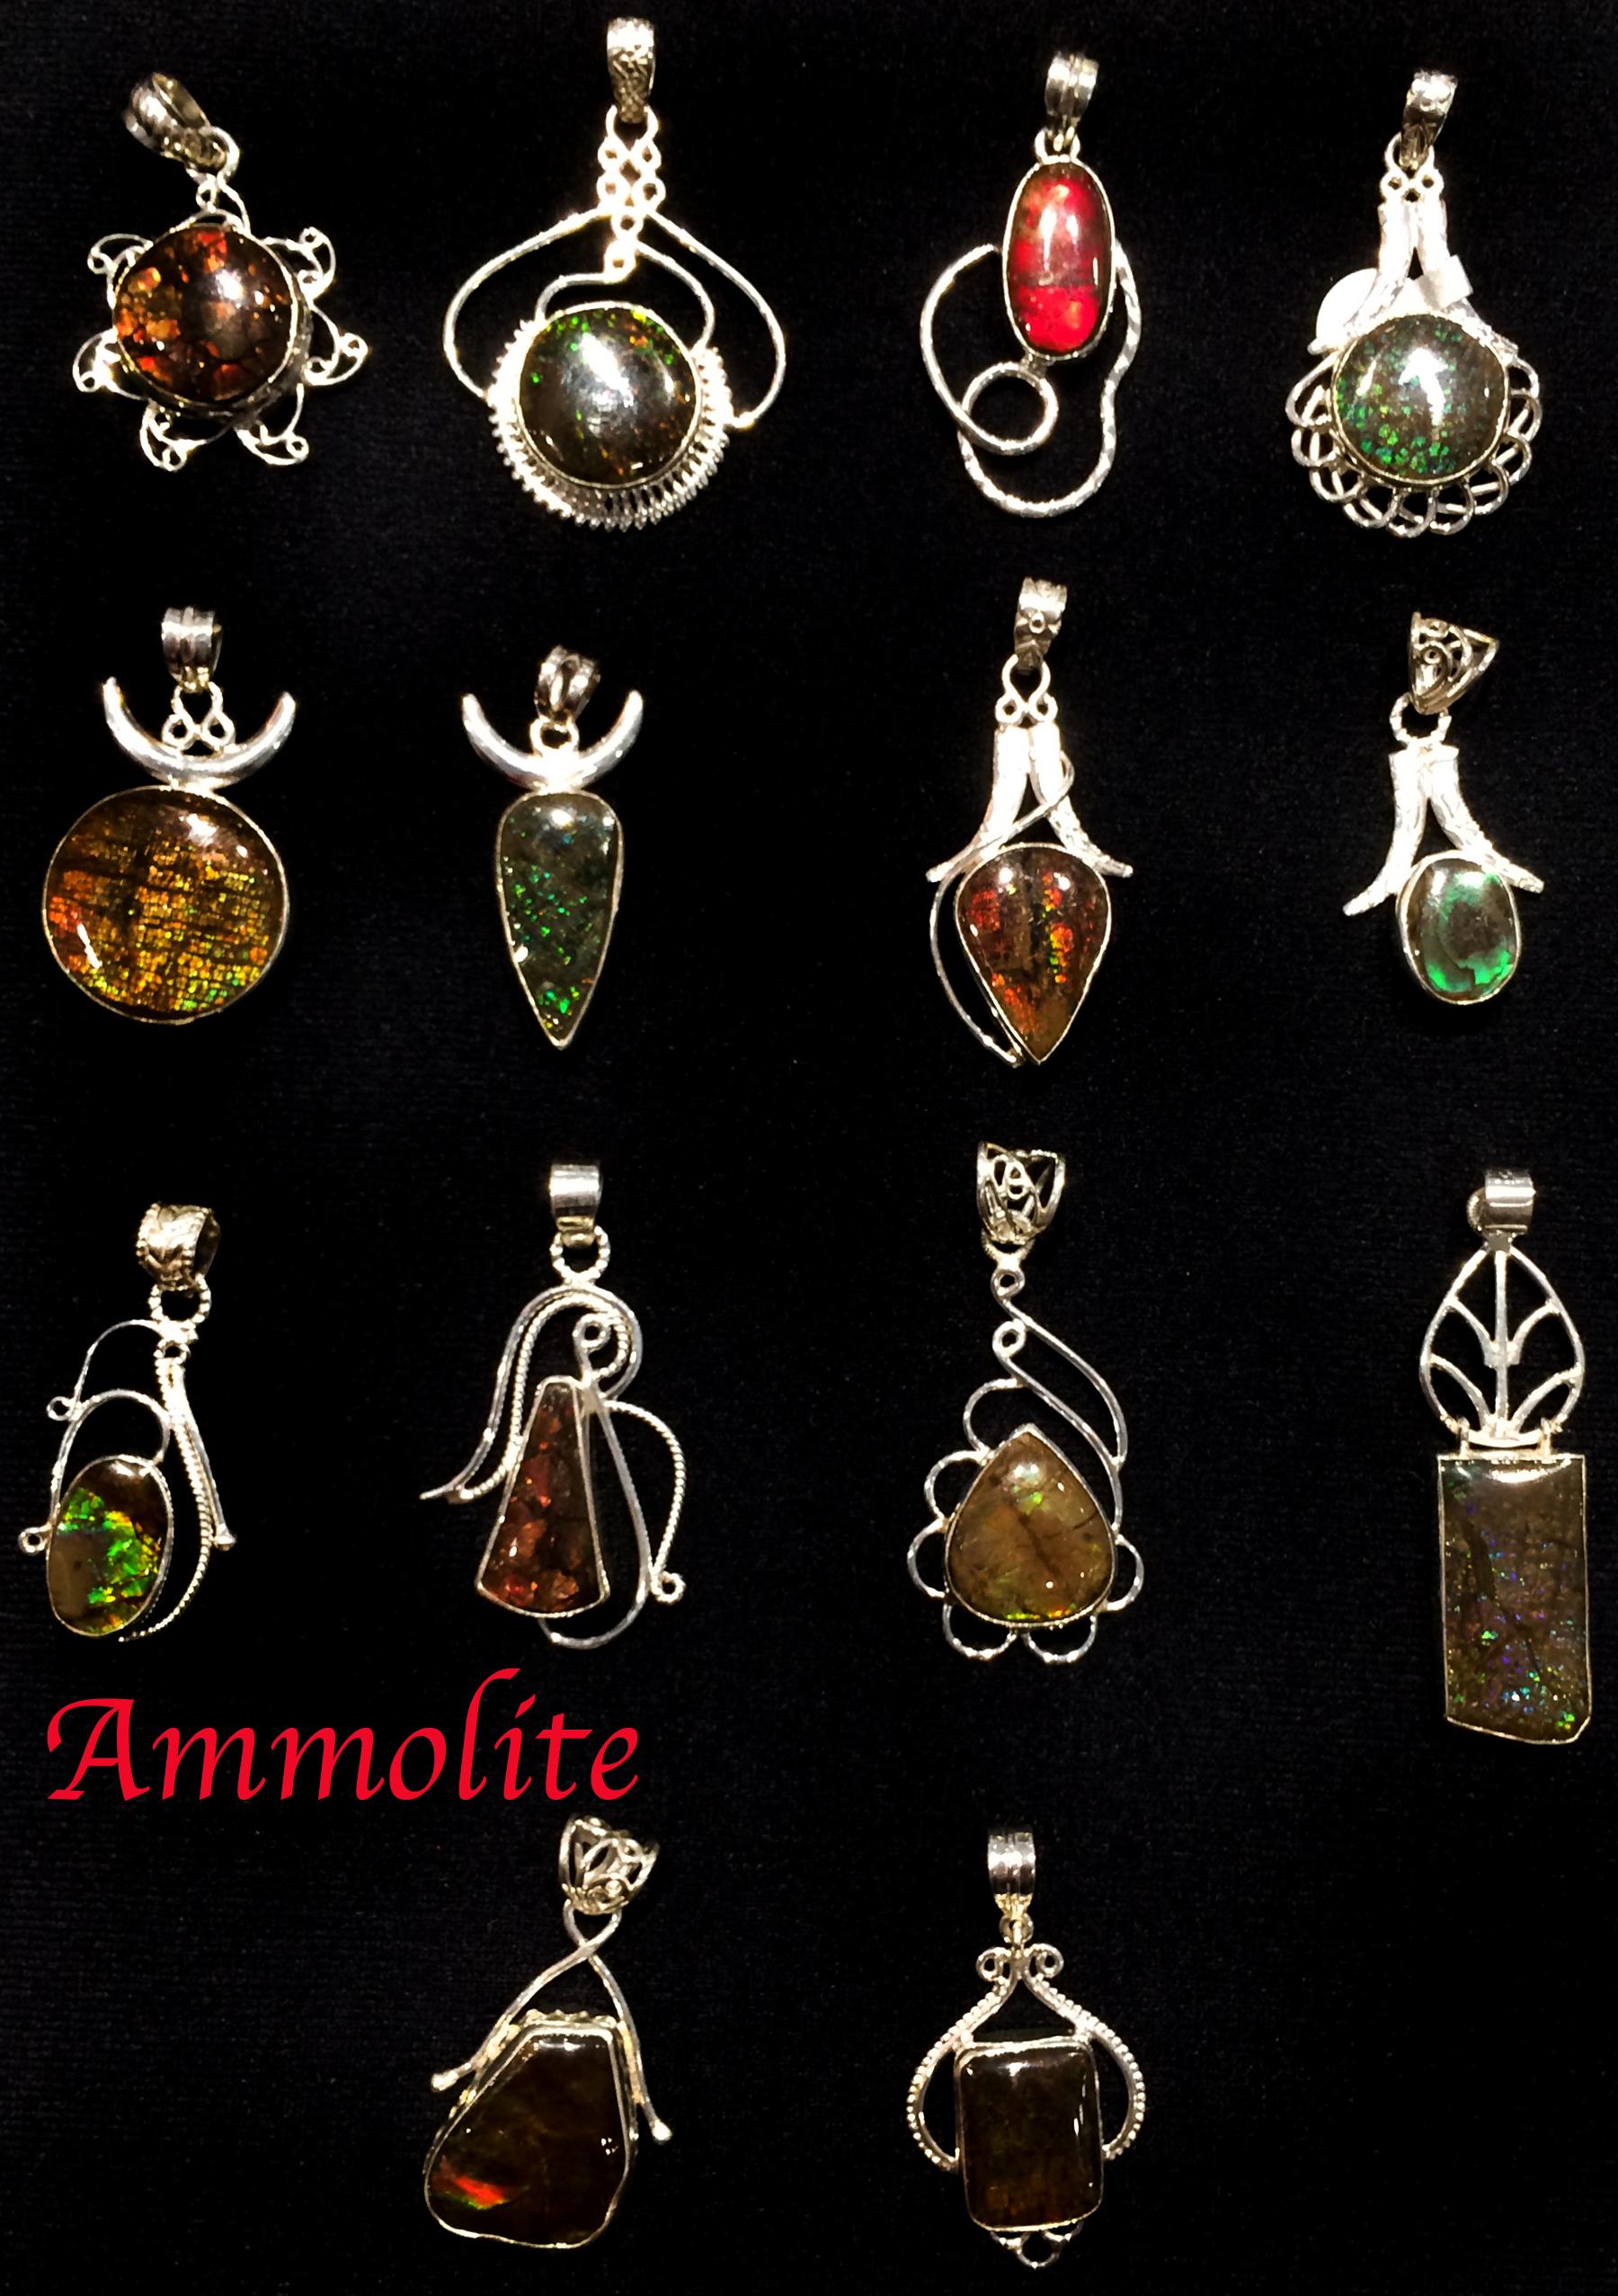 ammolite102115.jpg